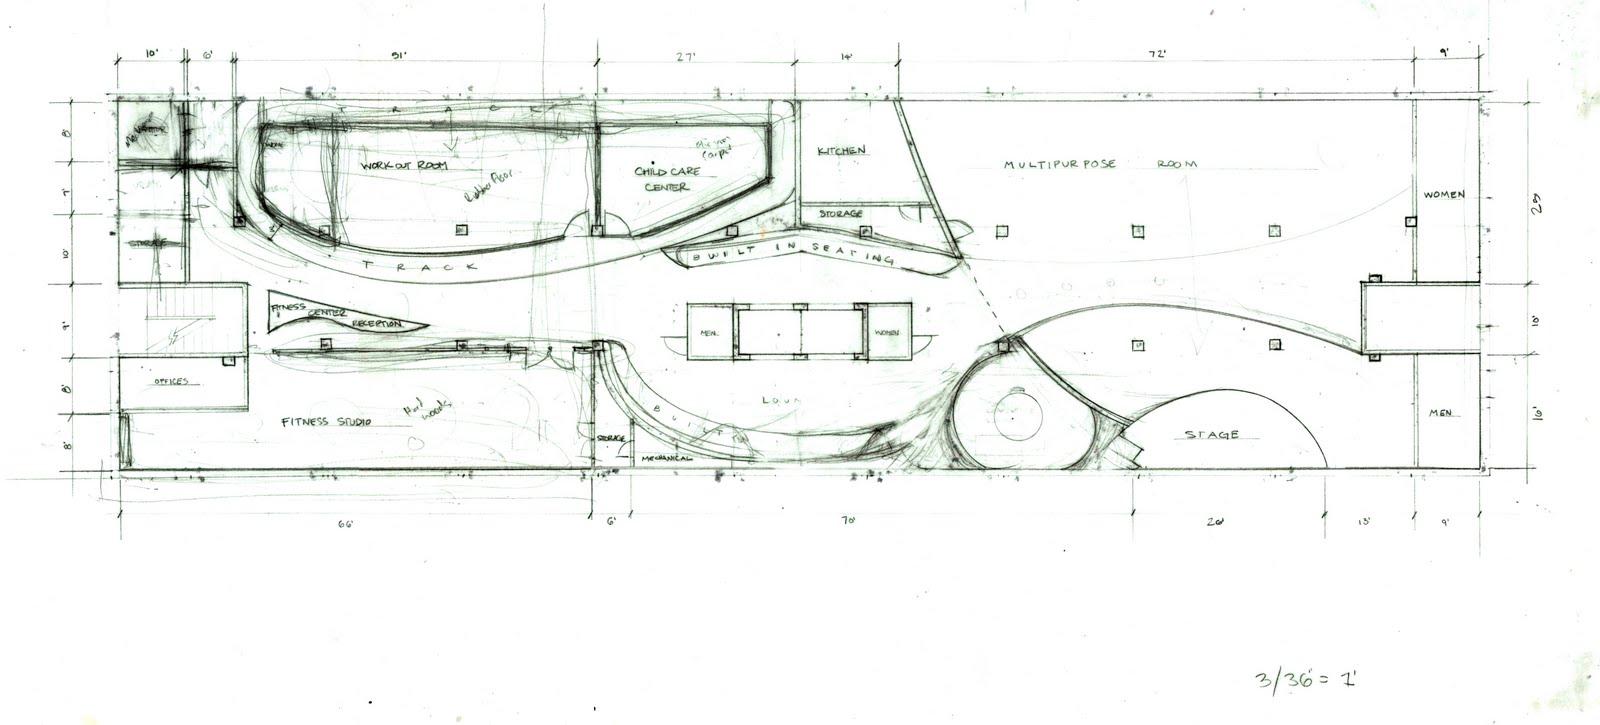 consider process design march 2010 ino designs dimensioned floor plan